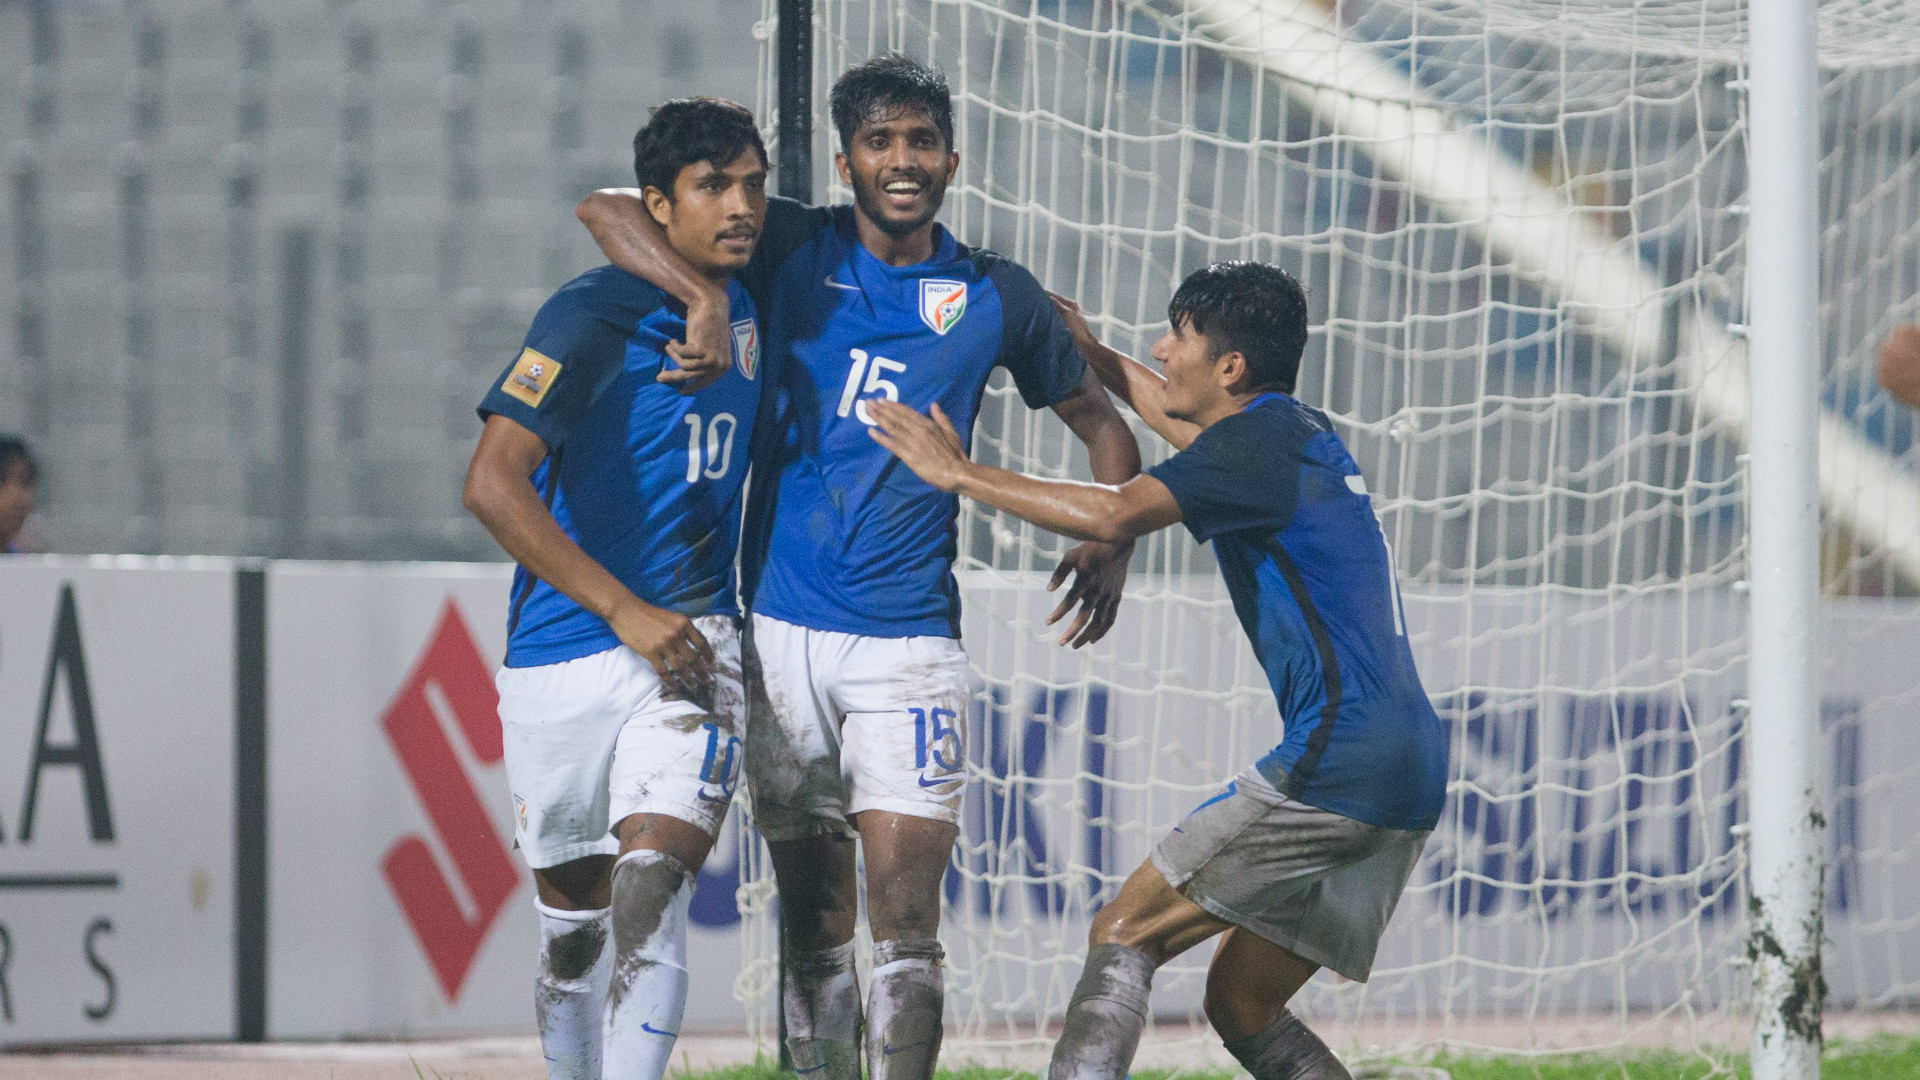 2018 Afc U 23 Championship Qualifiers India Vs Qatar – Dibujos Para